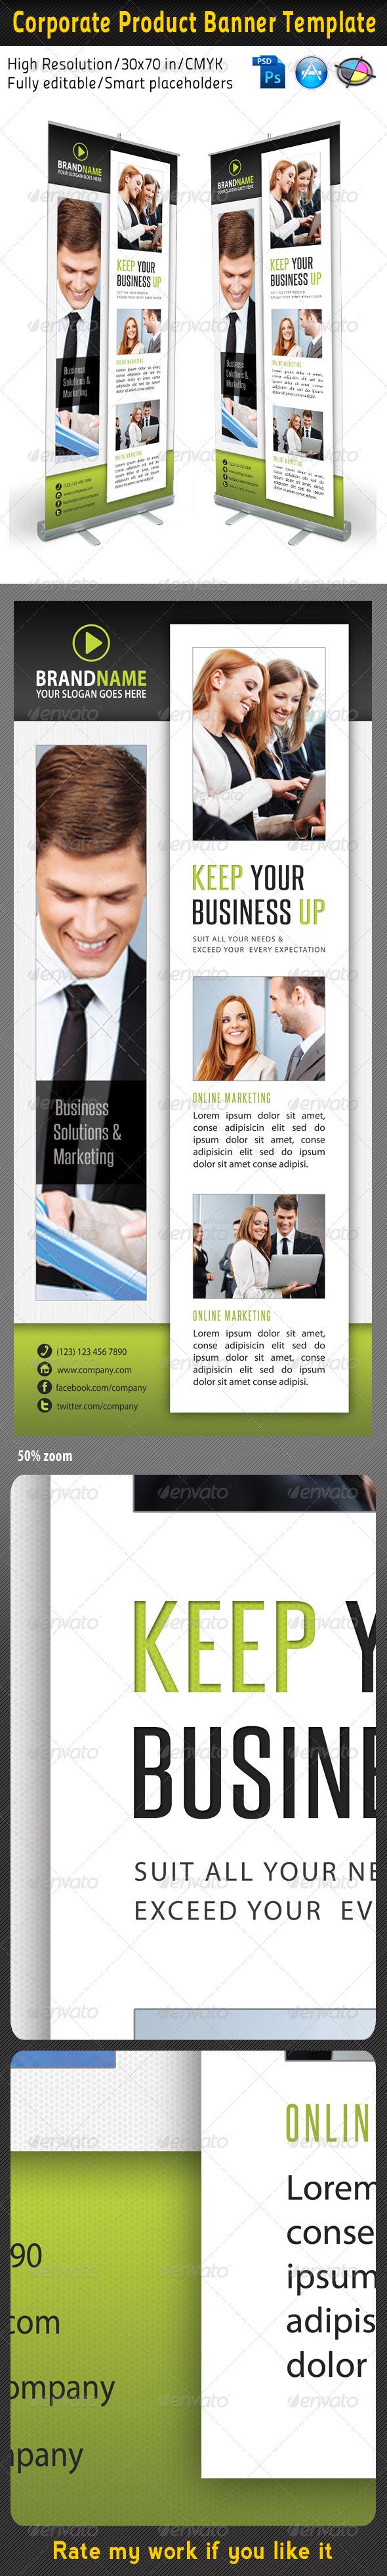 Corporate Multipurpose Banner Template 30 - Signage Print Templates